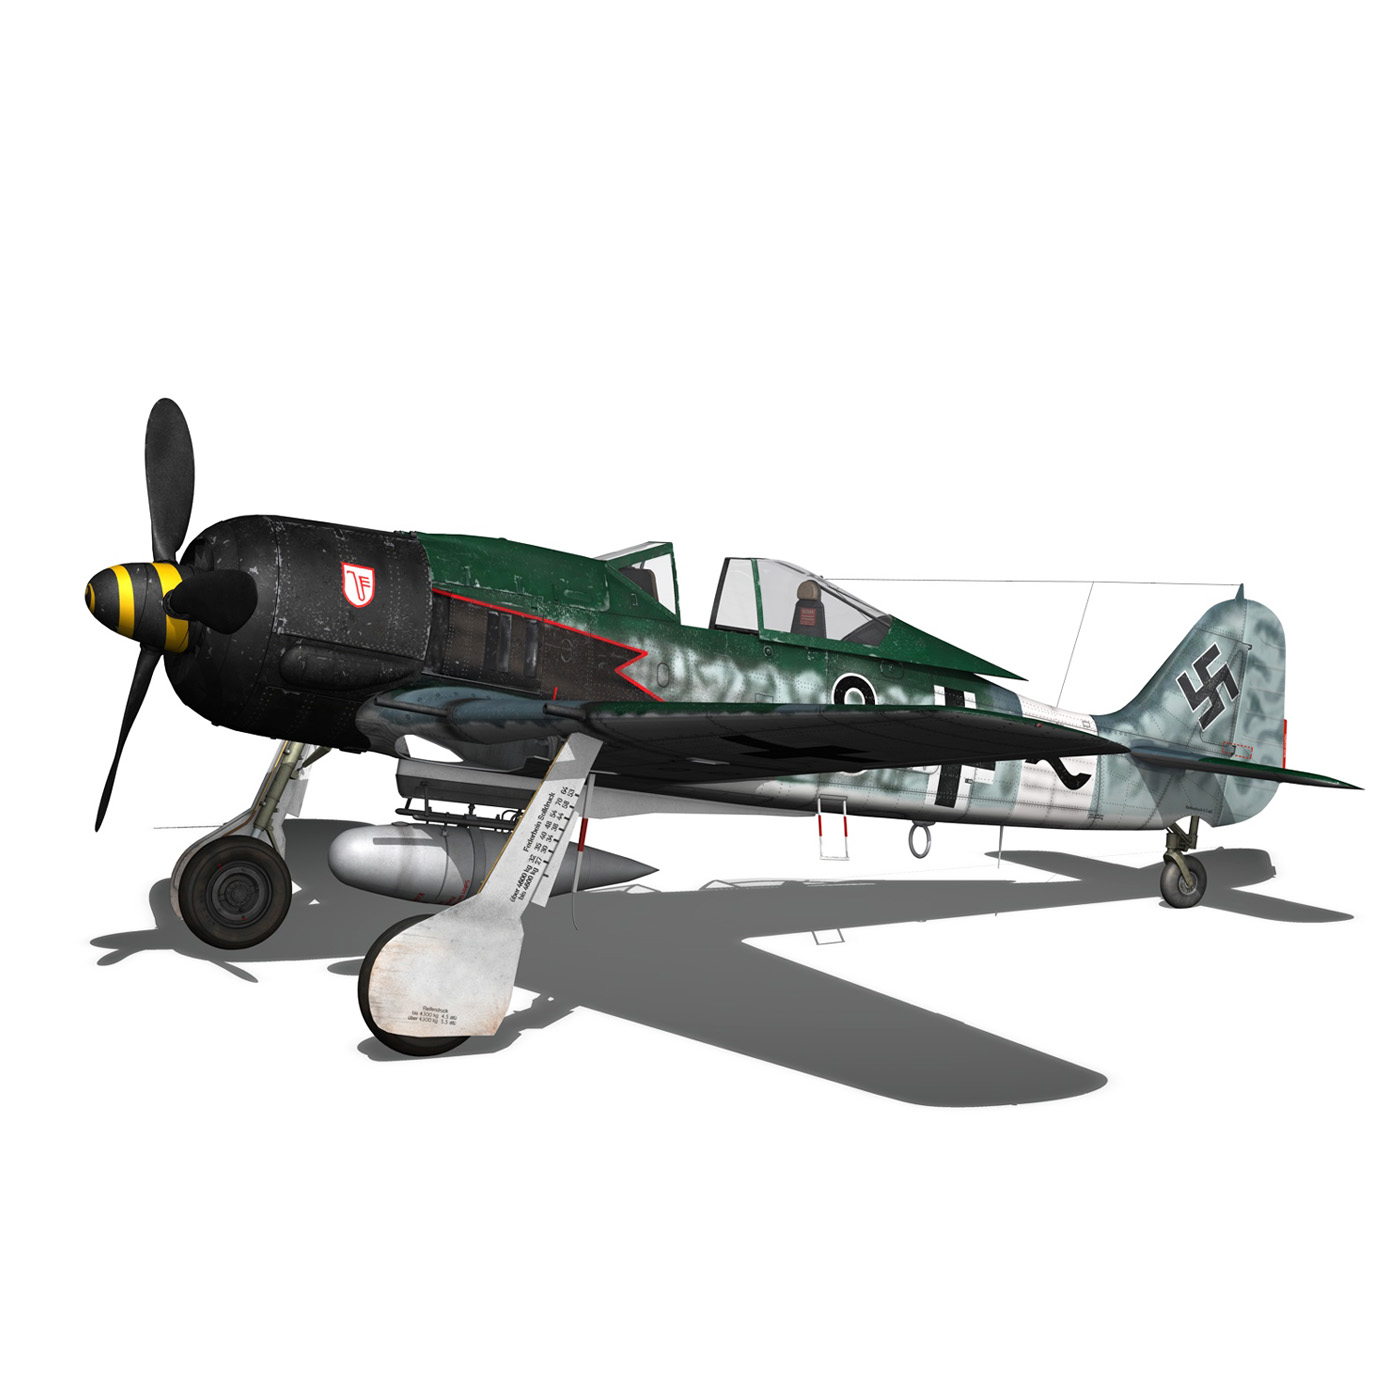 focke wulf – fw190 a8 – black 8 3d model 3ds c4d fbx lwo lw lws obj 266060